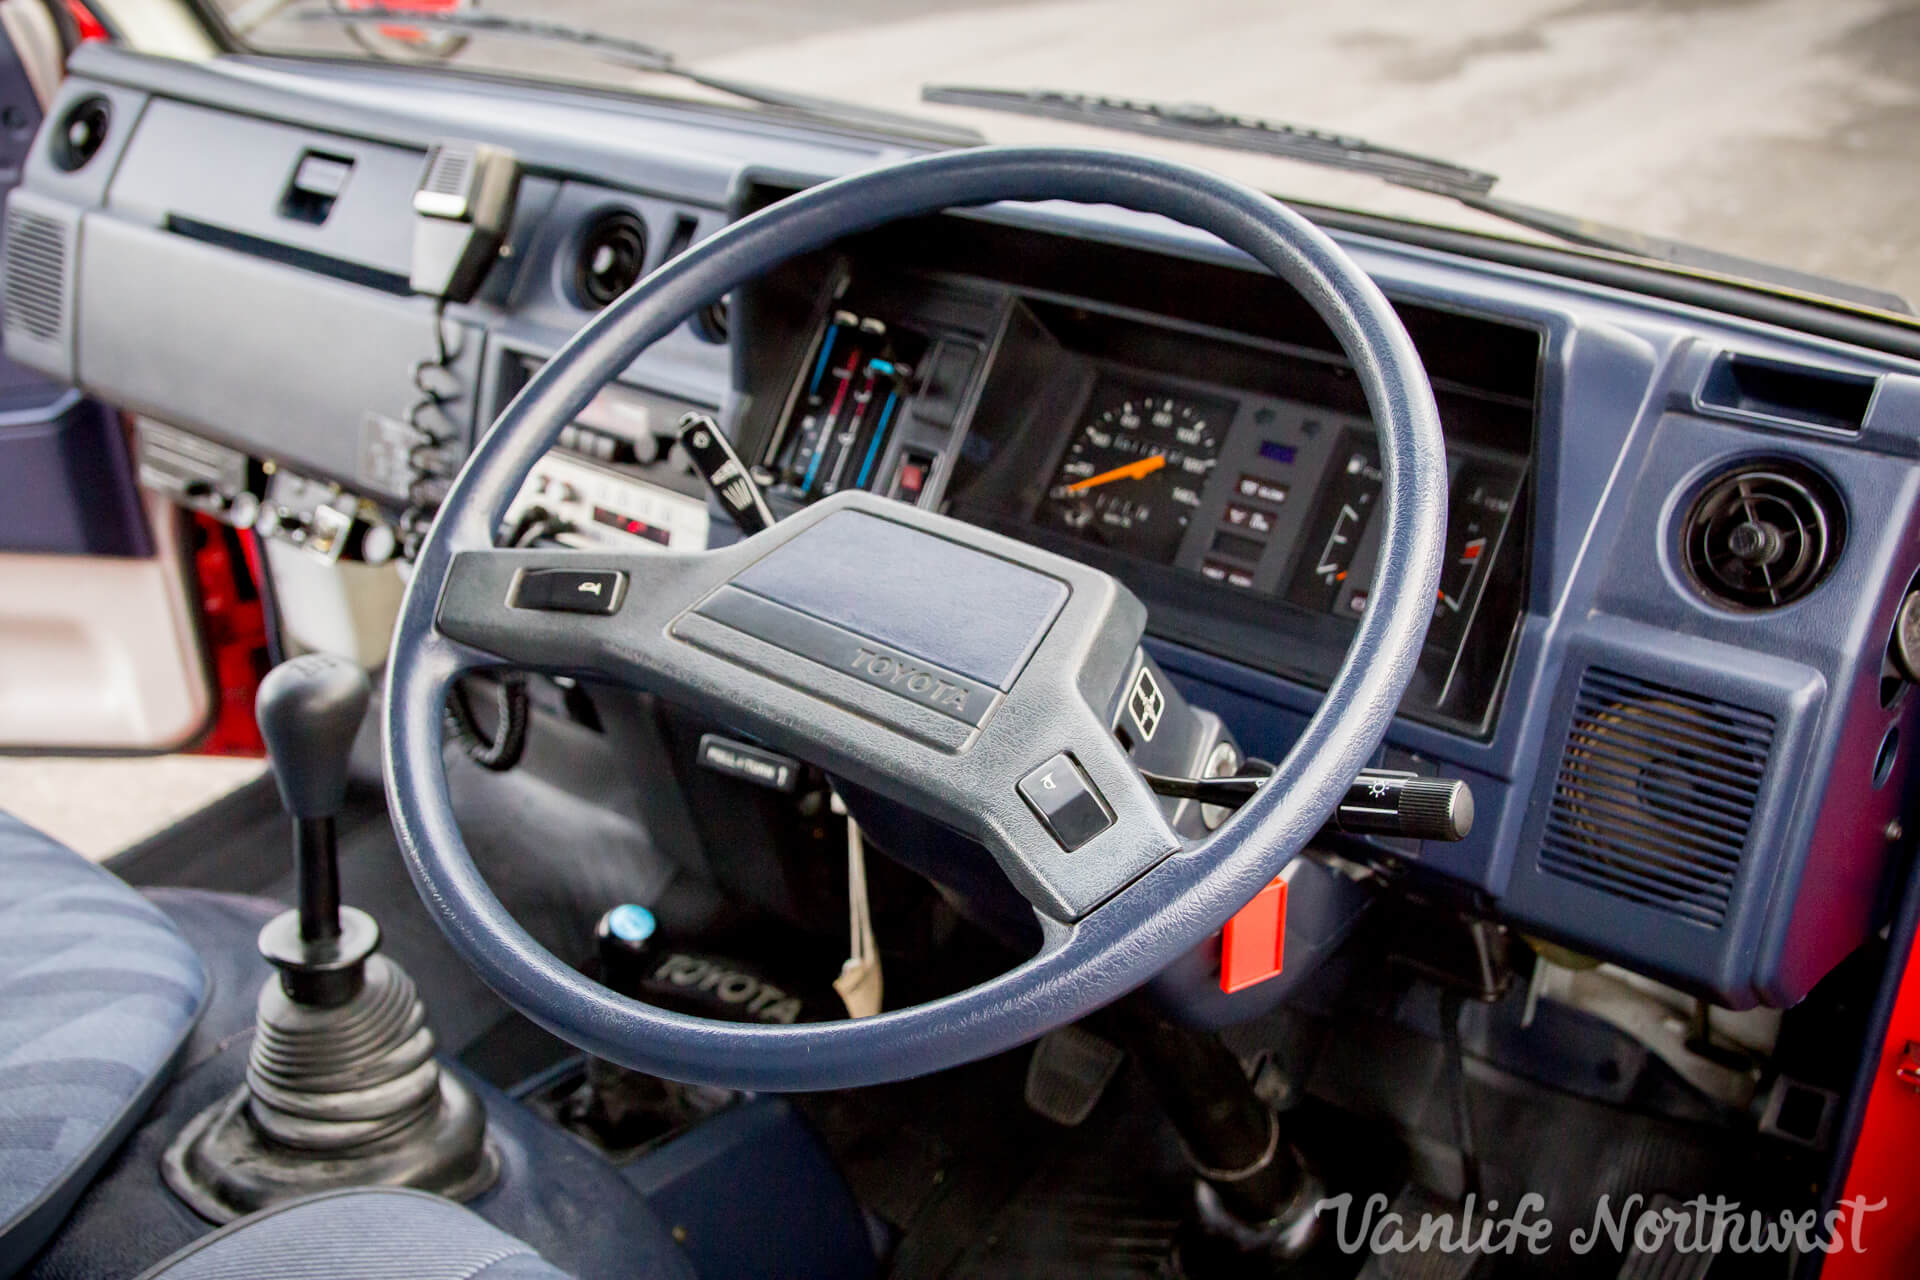 ToyotaHiaceFireTruckLH851990-27.jpg